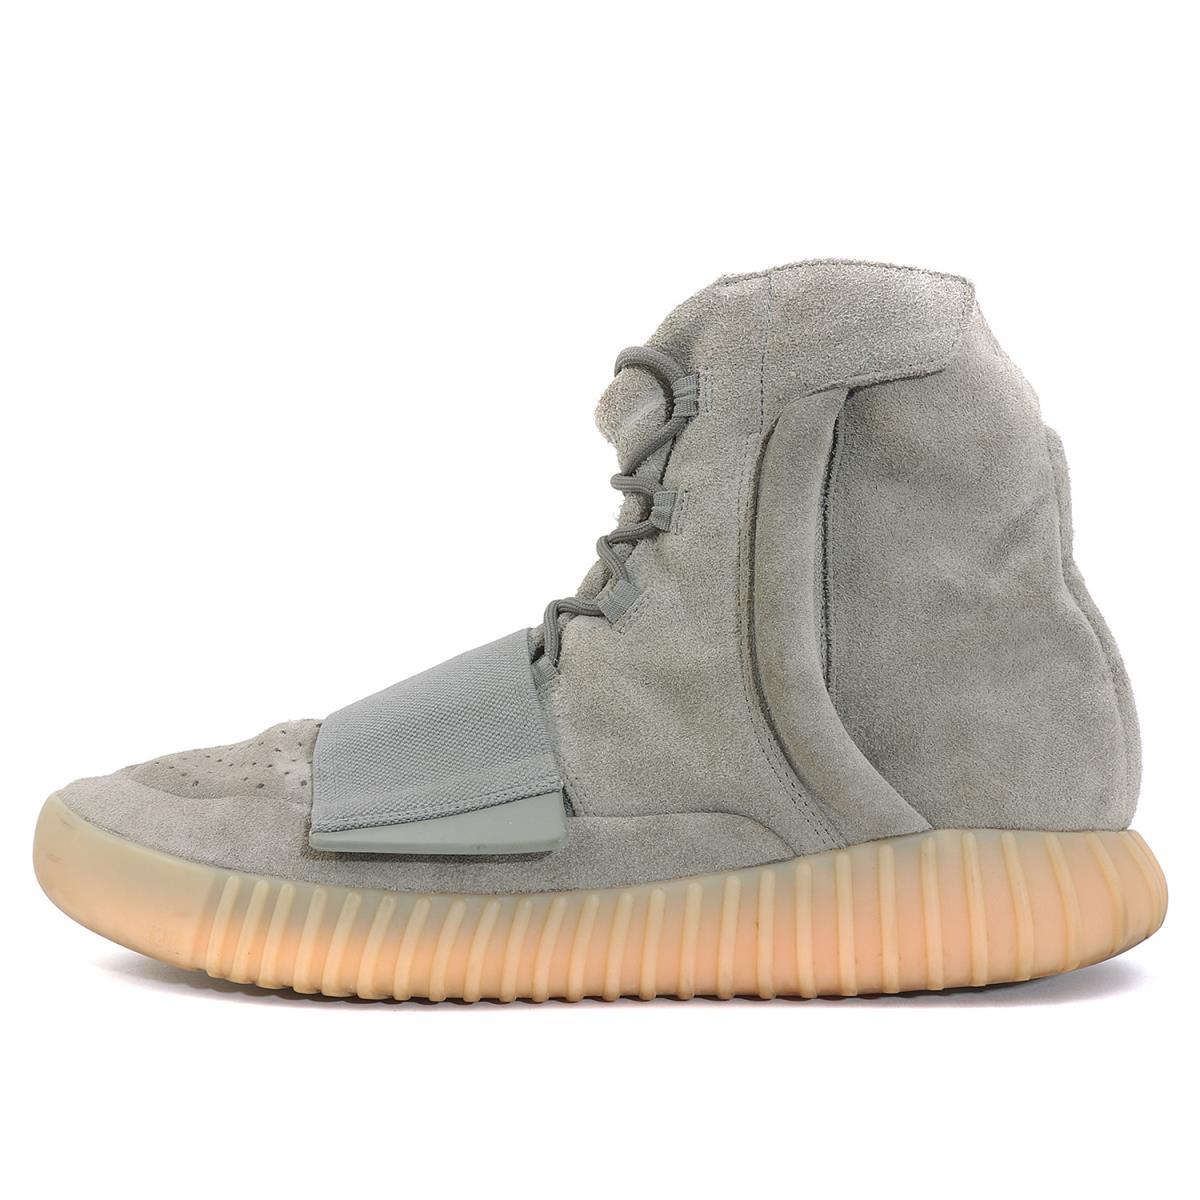 adidas (アディダス) 16S/S YEEZY BOOST 750 Light Grey (BB1840) ライトグレー US12(30cm) 【メンズ】【K2072】【中古】【あす楽☆対応可】